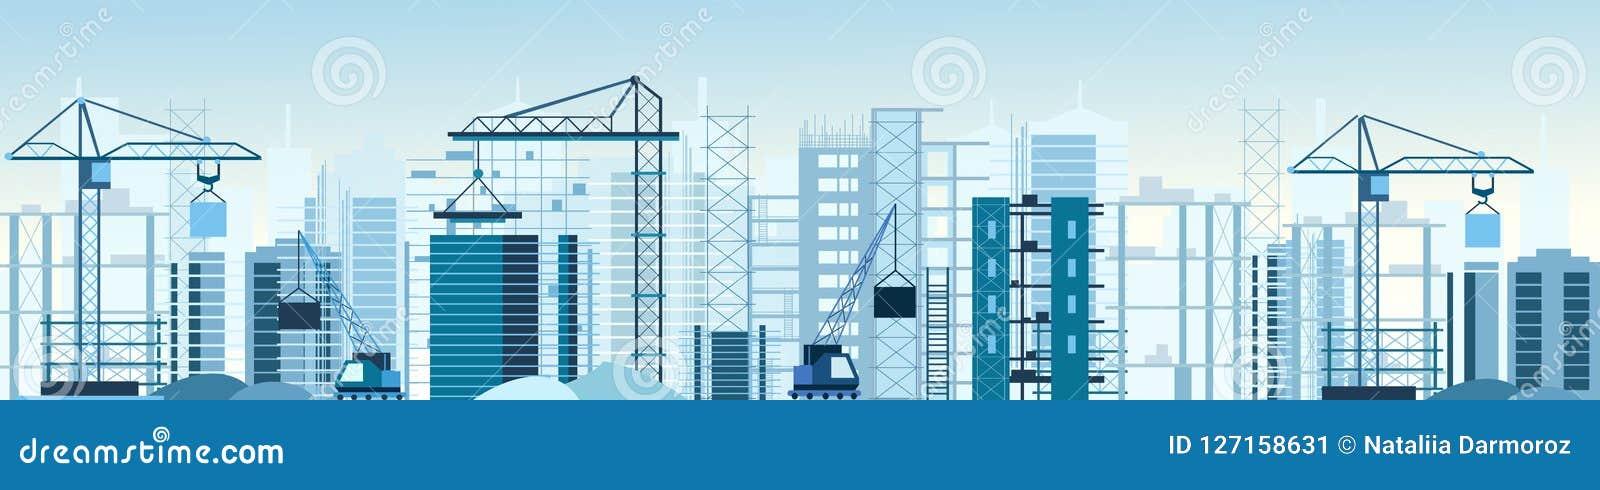 Vector illustration of buildings constructions site and cranes banner. skyscraper under construction. excavator, tipper